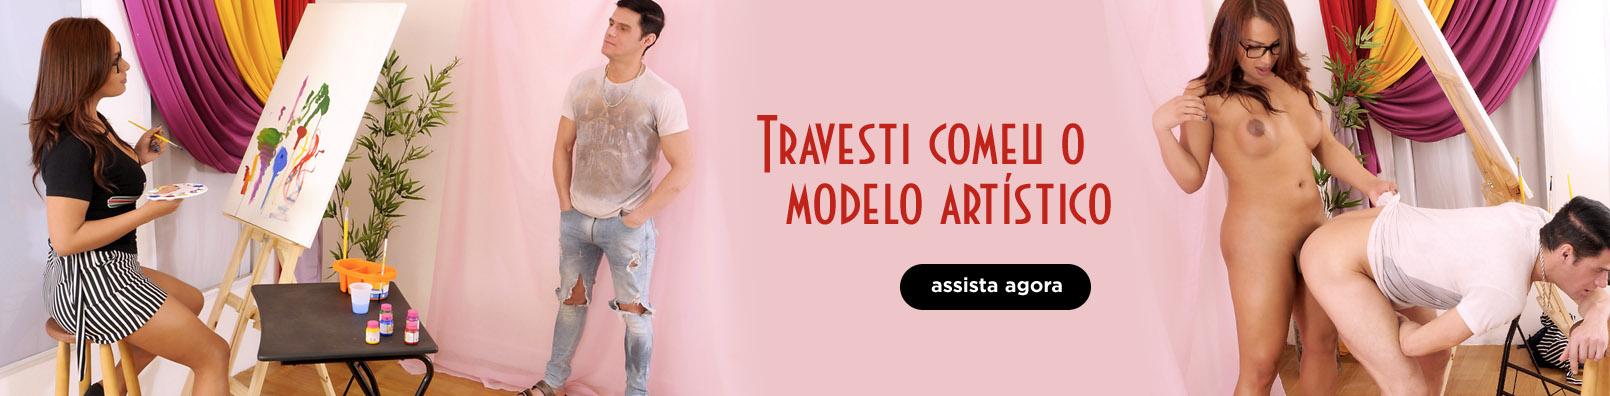 Travesti comeu o modelo artístico